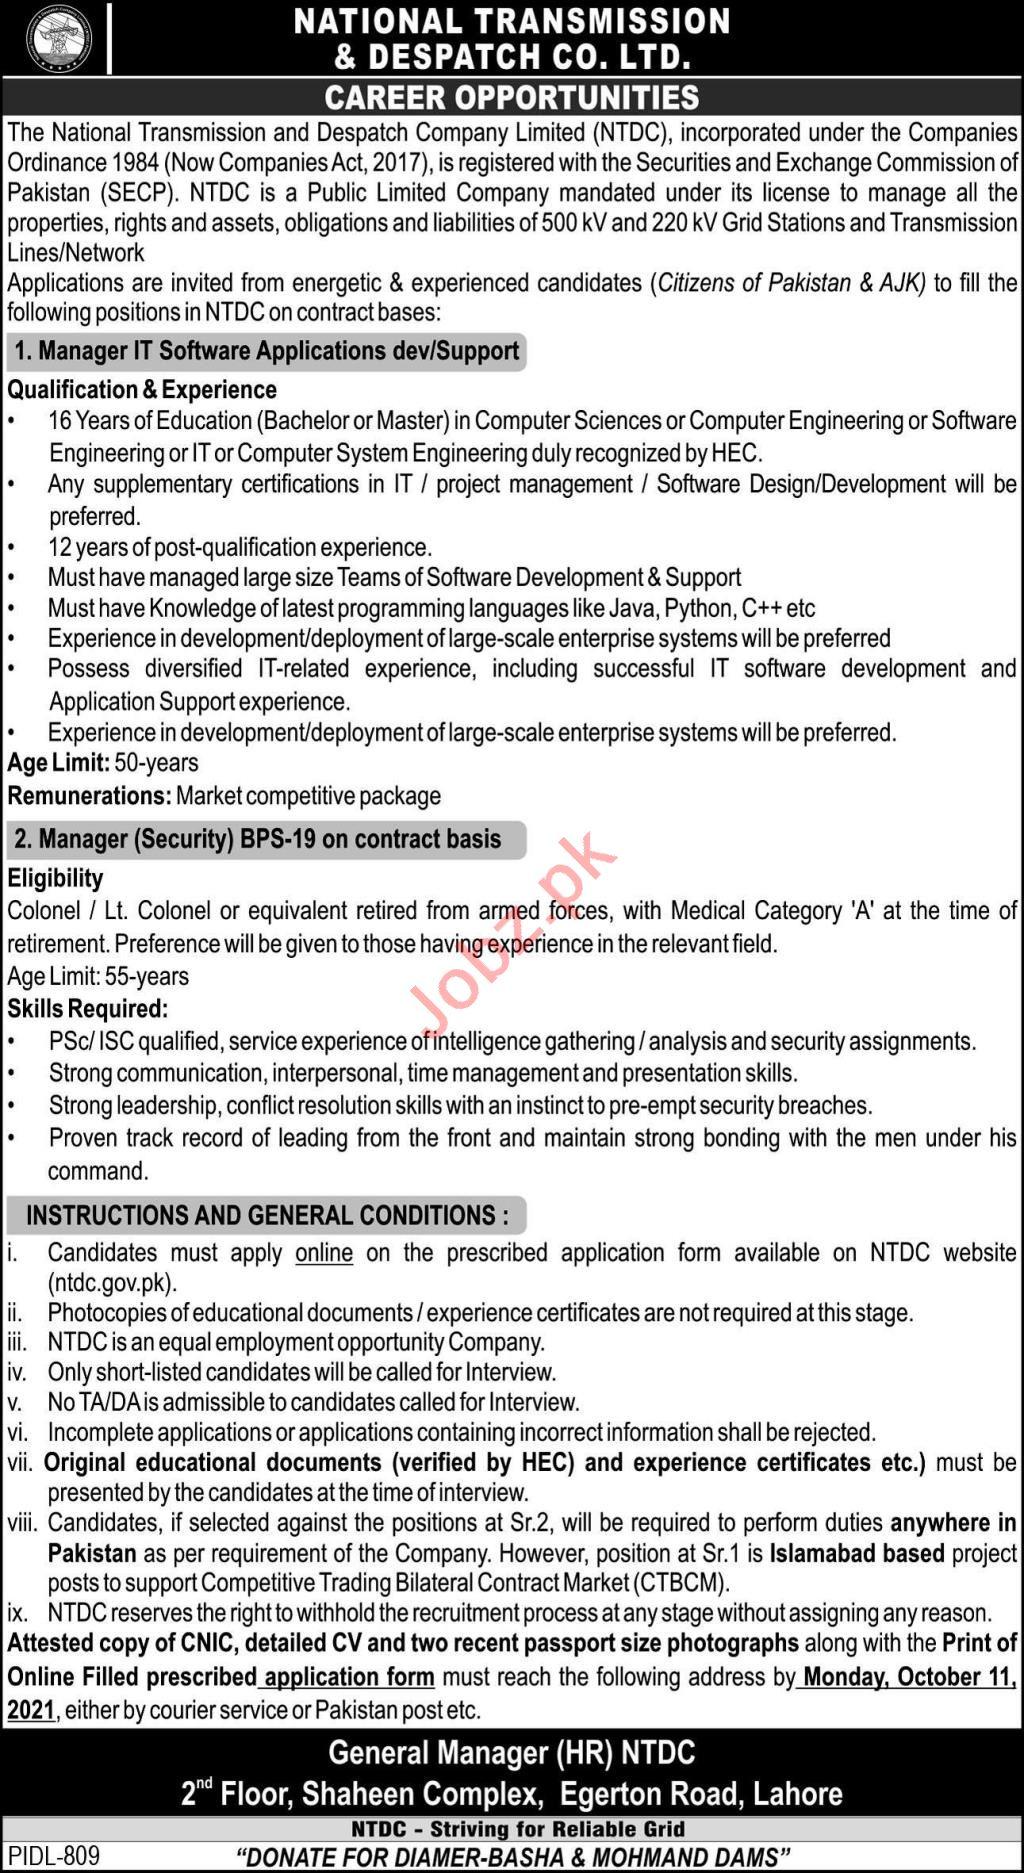 National Transmission & Despatch Company Jobs 2021